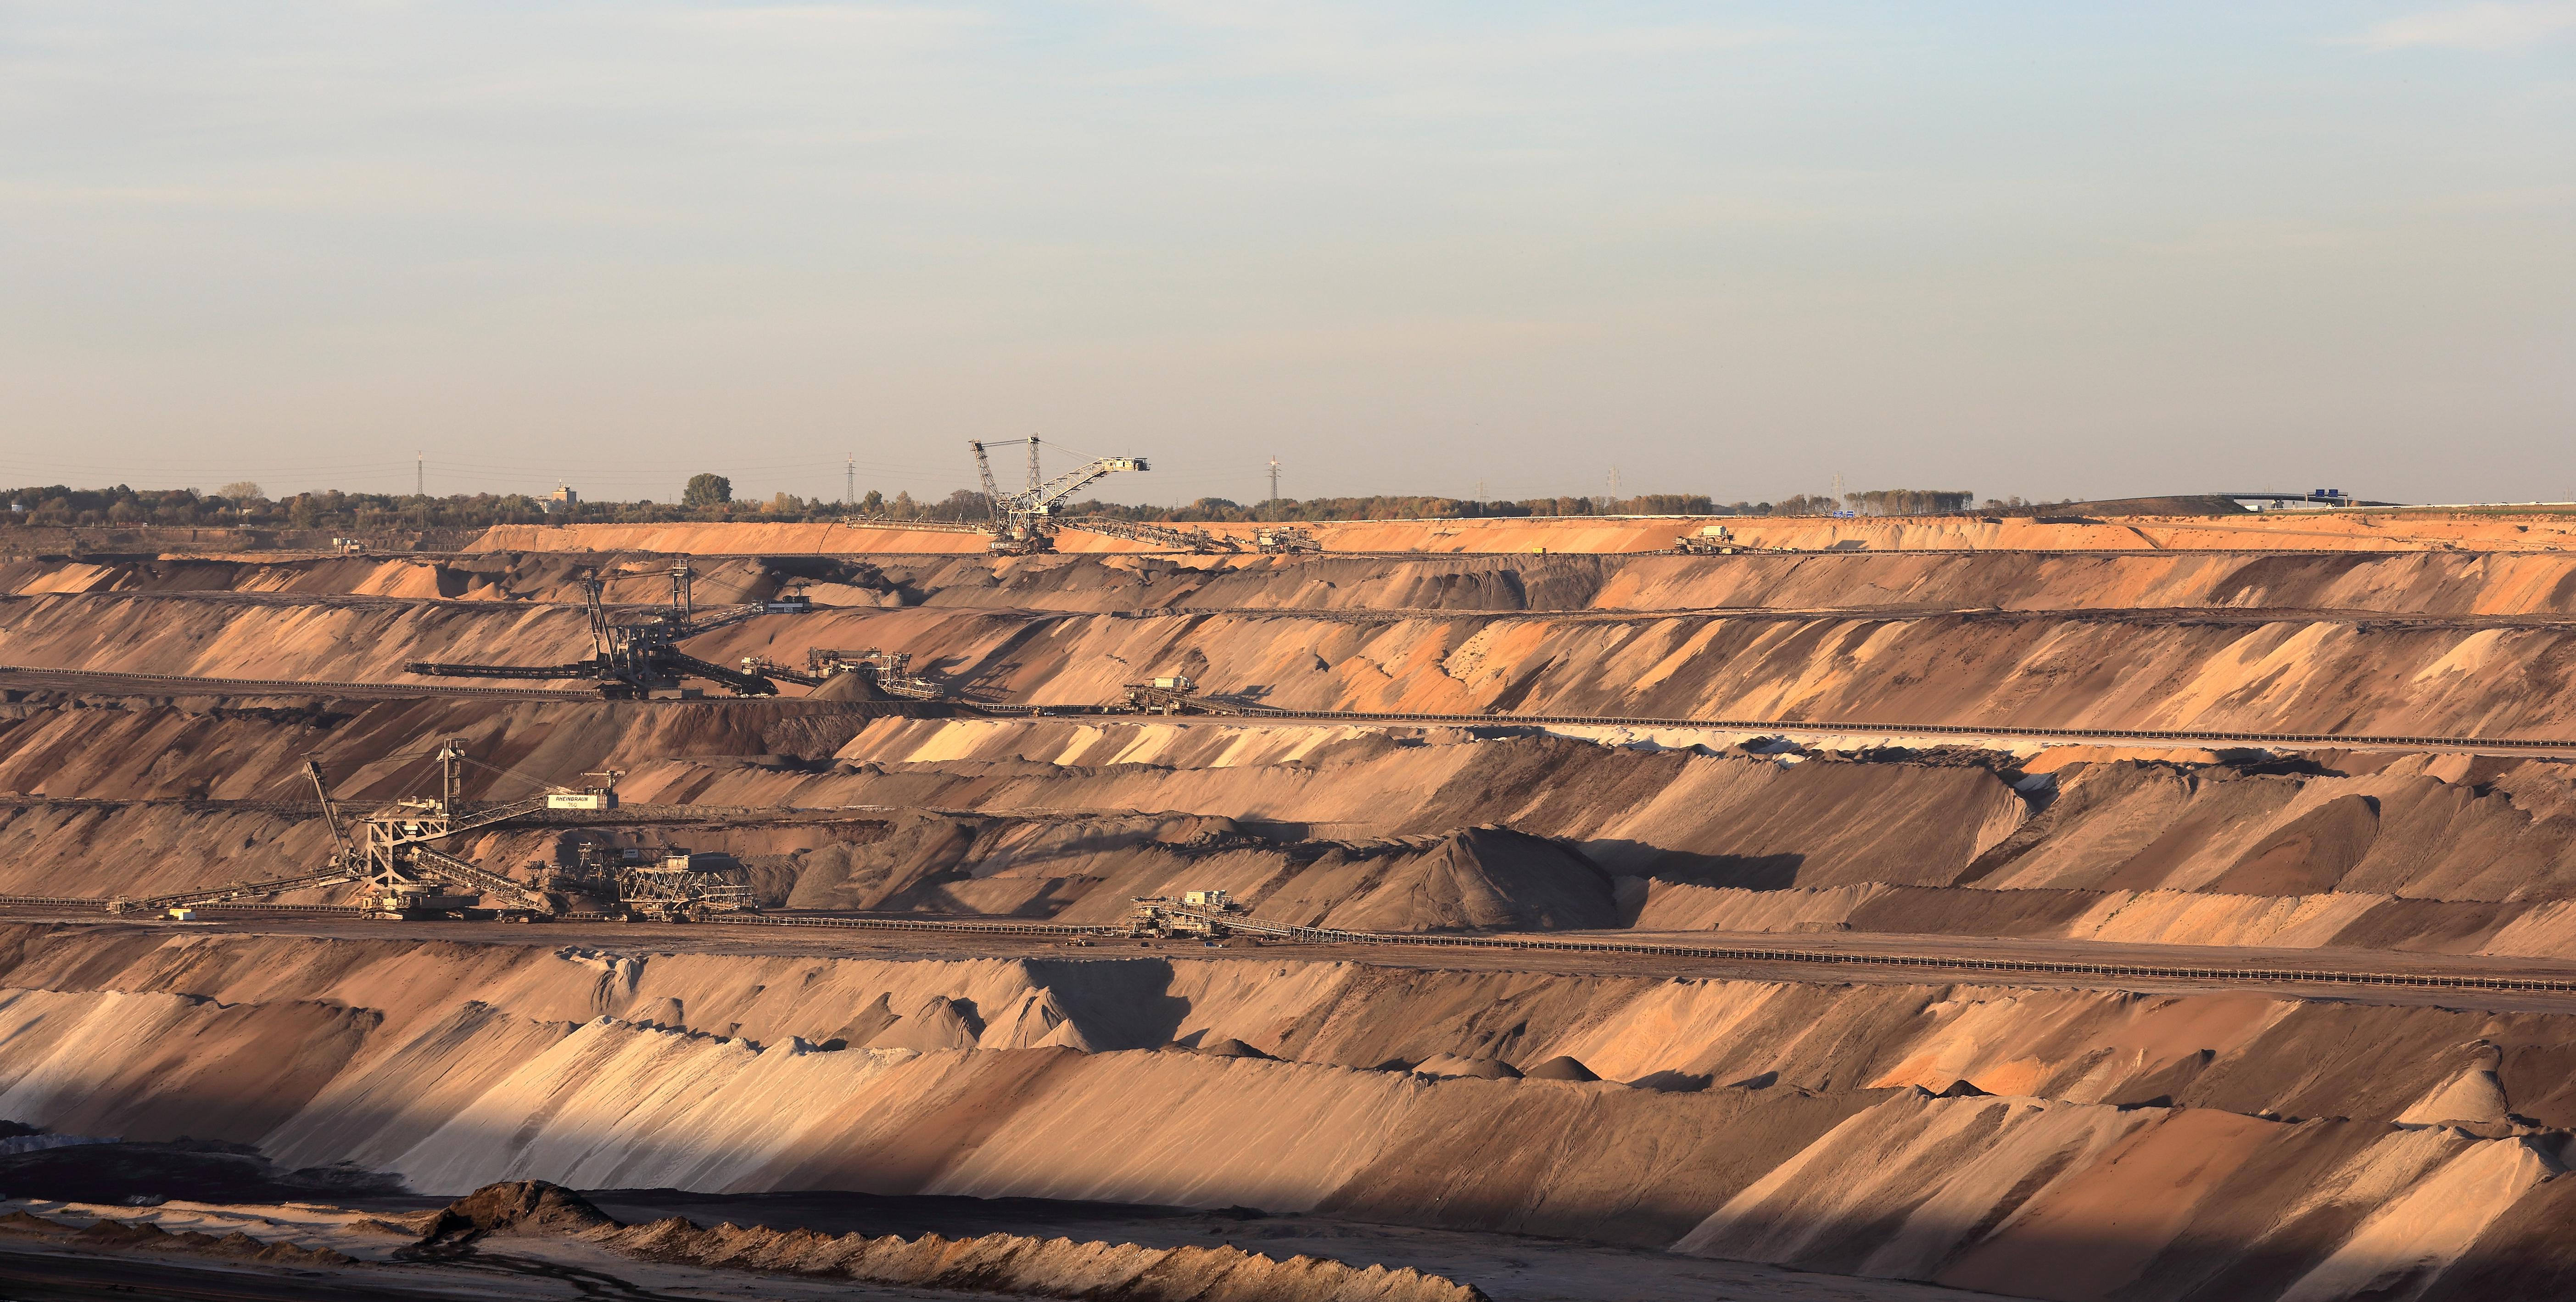 https://upload.wikimedia.org/wikipedia/commons/b/b4/Garzweiler_surface_mine%2C_October_2018%2C_-02.jpg